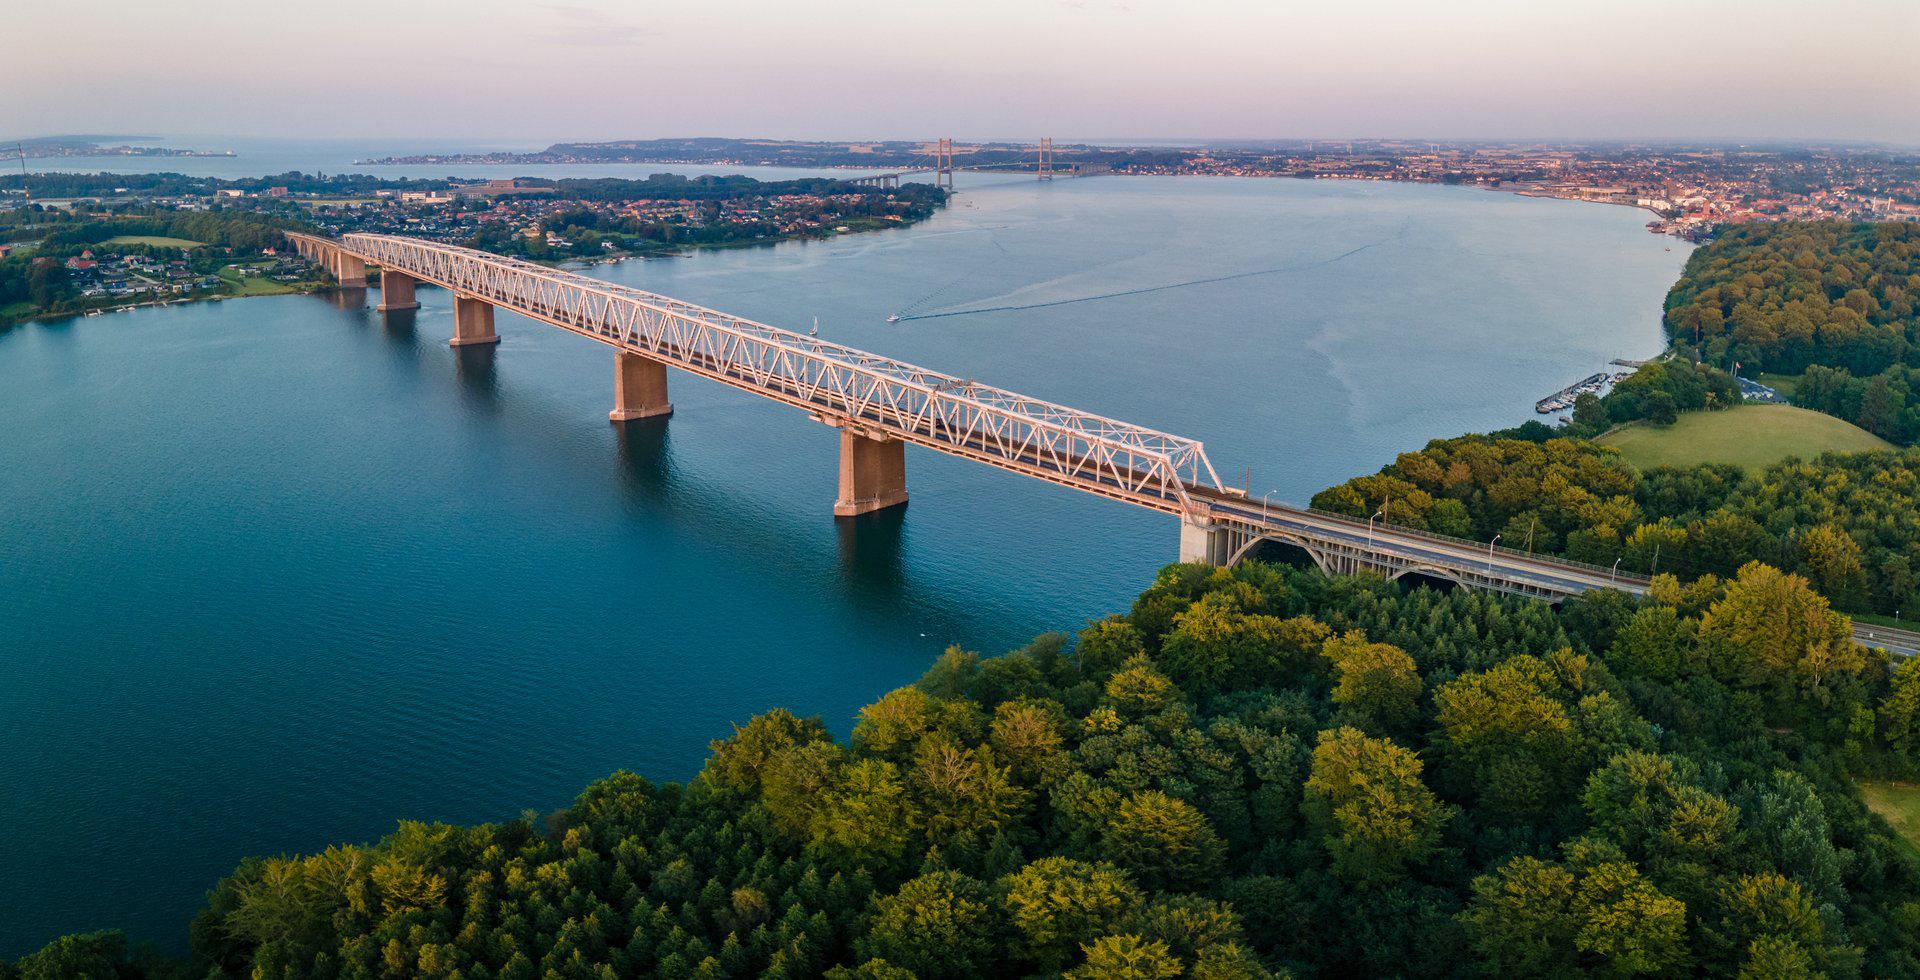 Die Lillebælt-Brücke